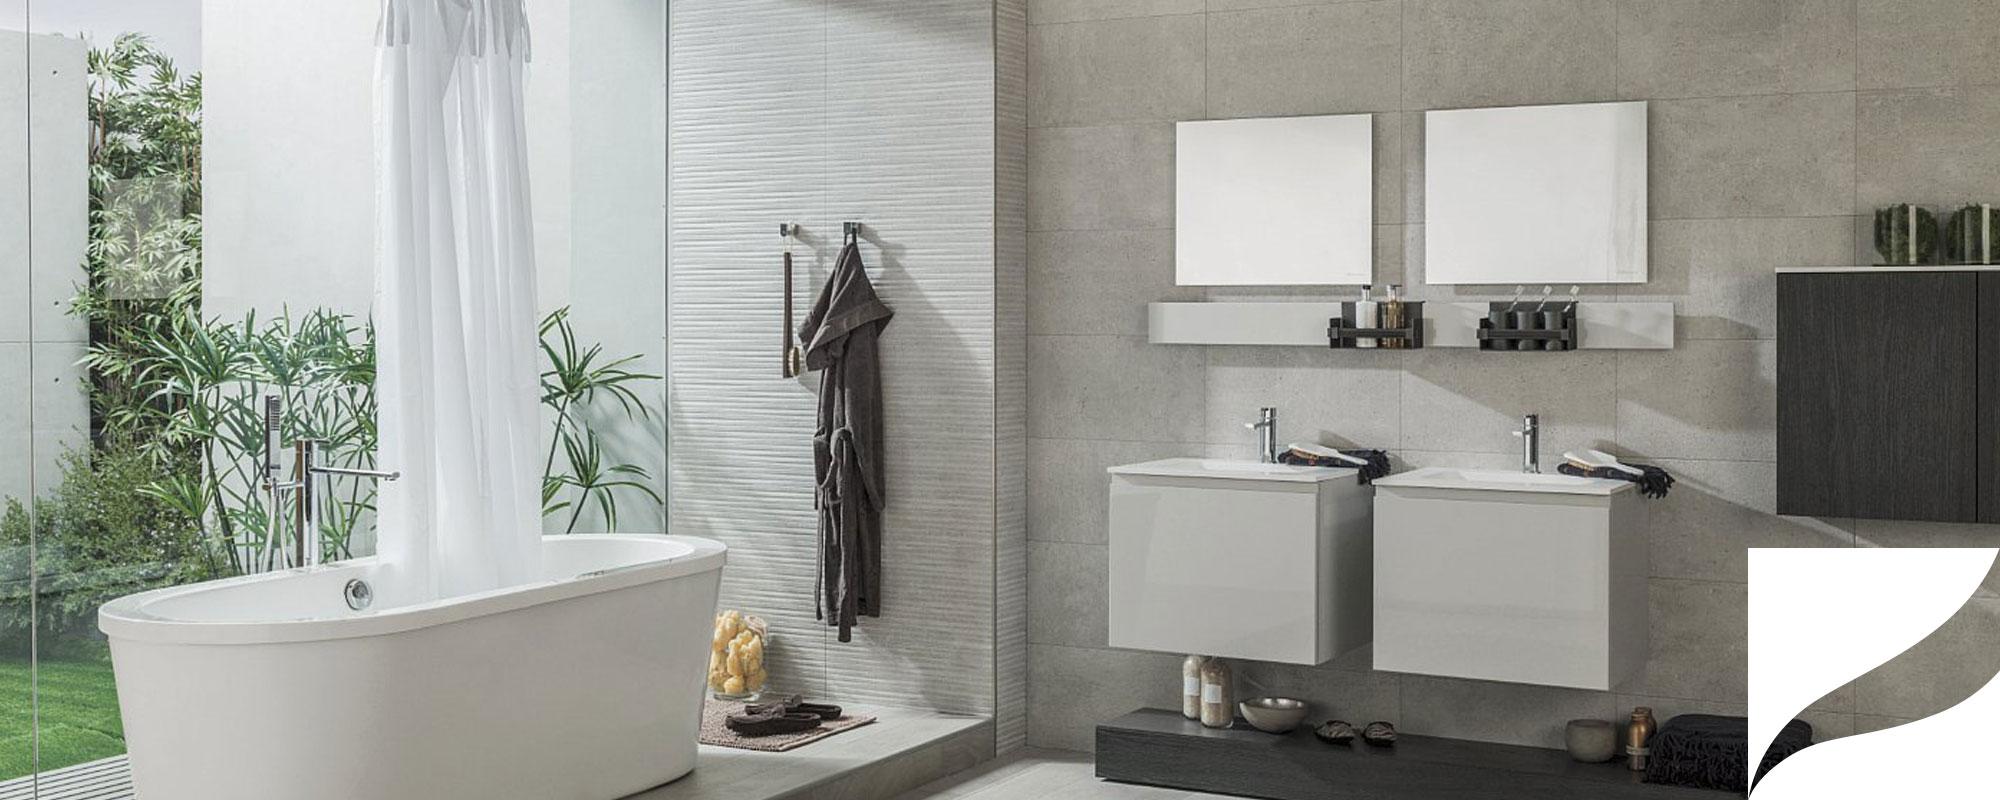 Bathroom Design Kildare ranges | bathrooms, showers, tiles, stoves | ger dooley's kildare